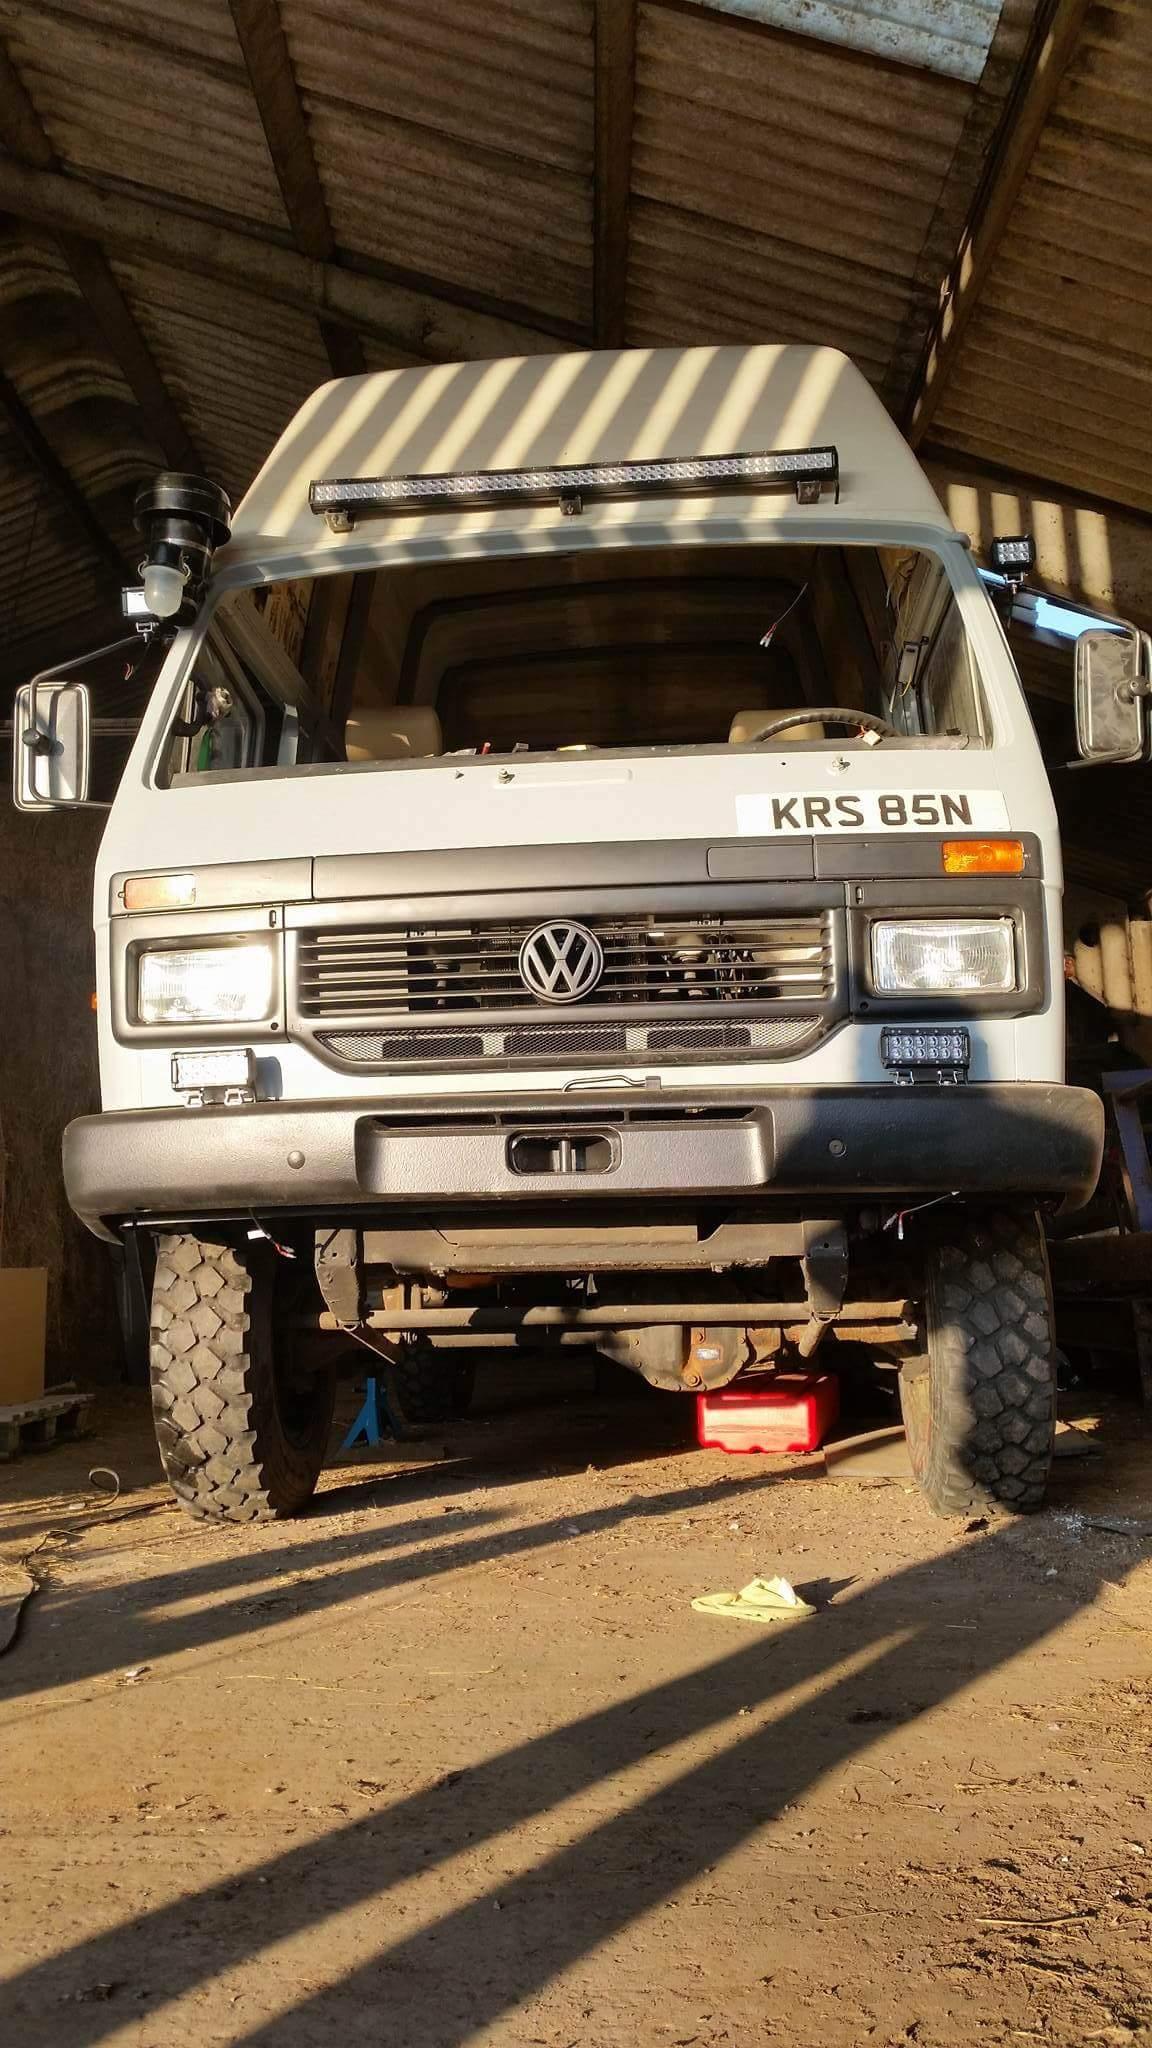 vwlt co uk wiki blog forum rh vwlt co uk VW LT Van VW LT Van